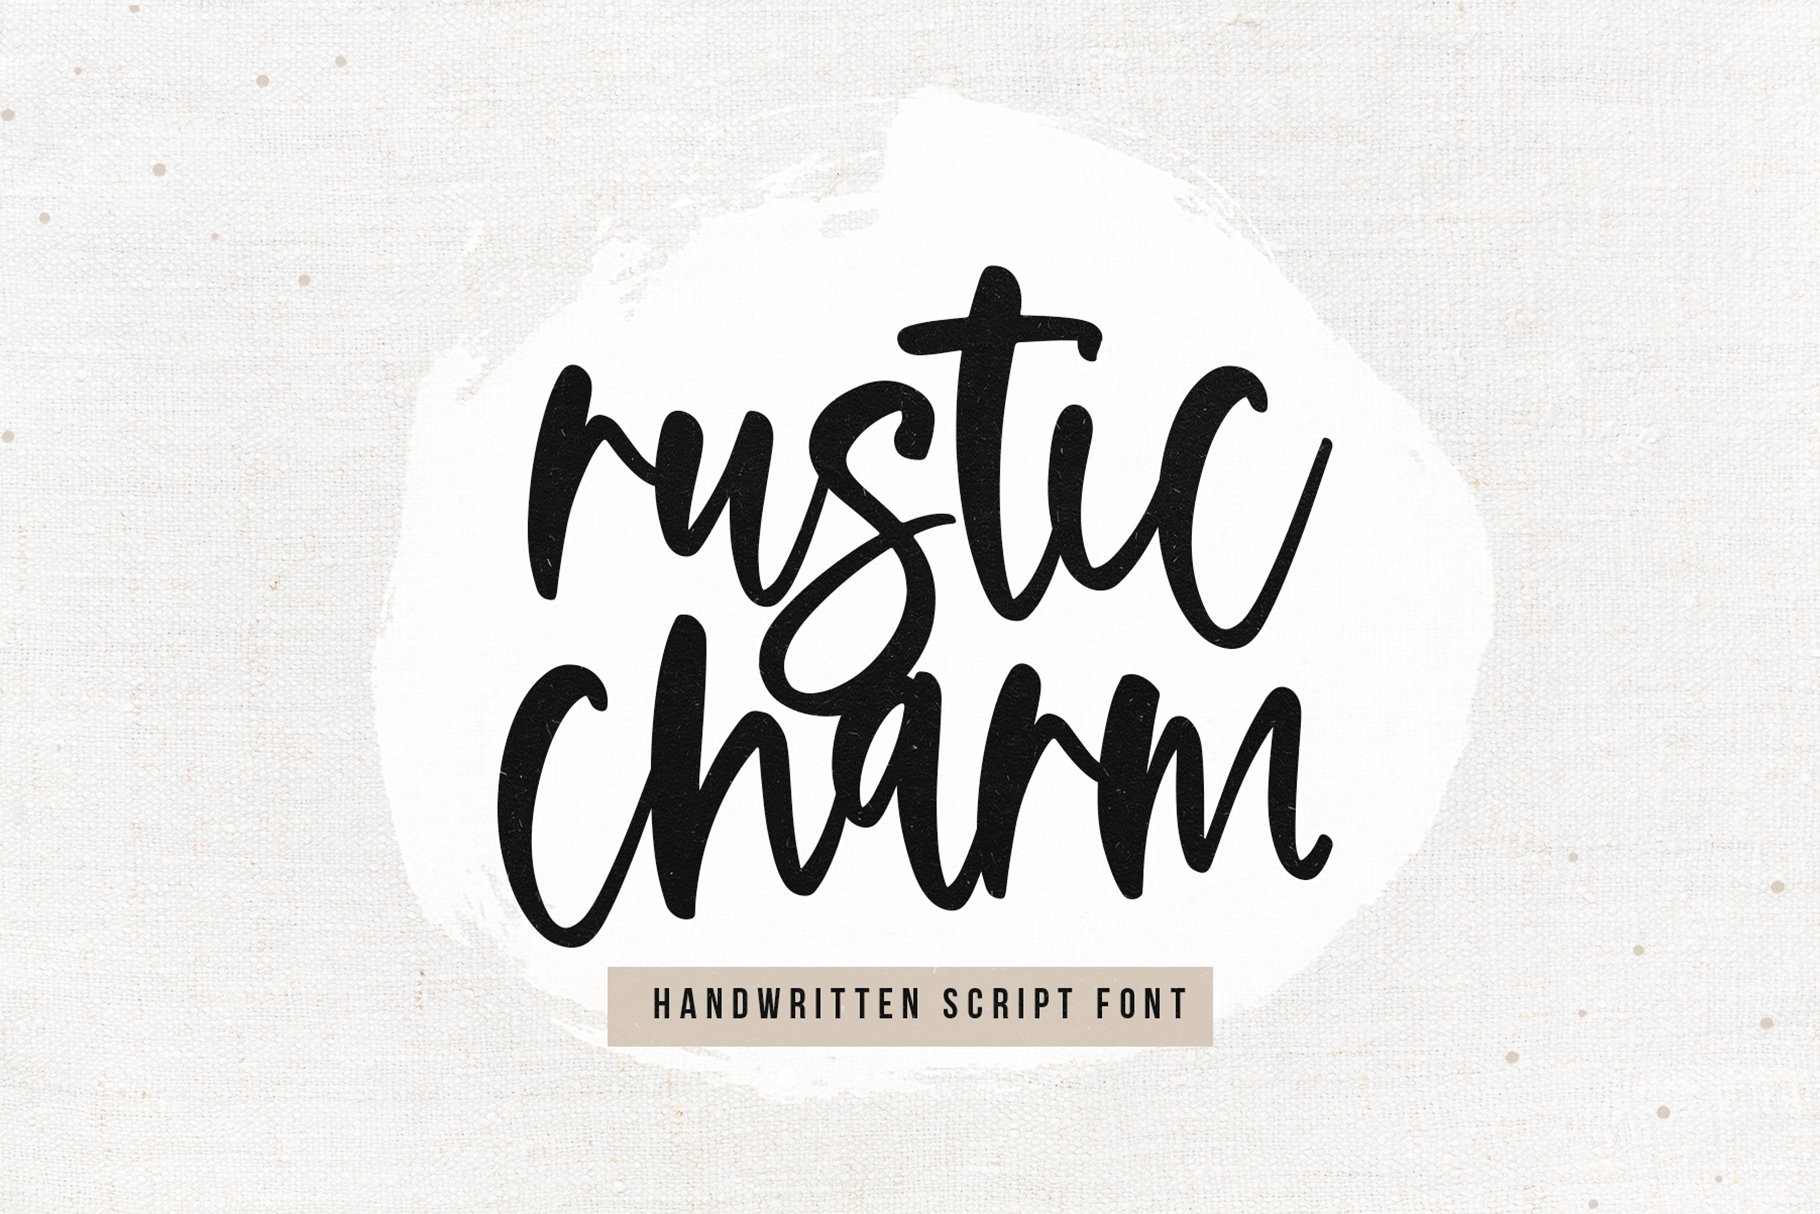 Rustic Charm - A Handwritten Script Font example image 1